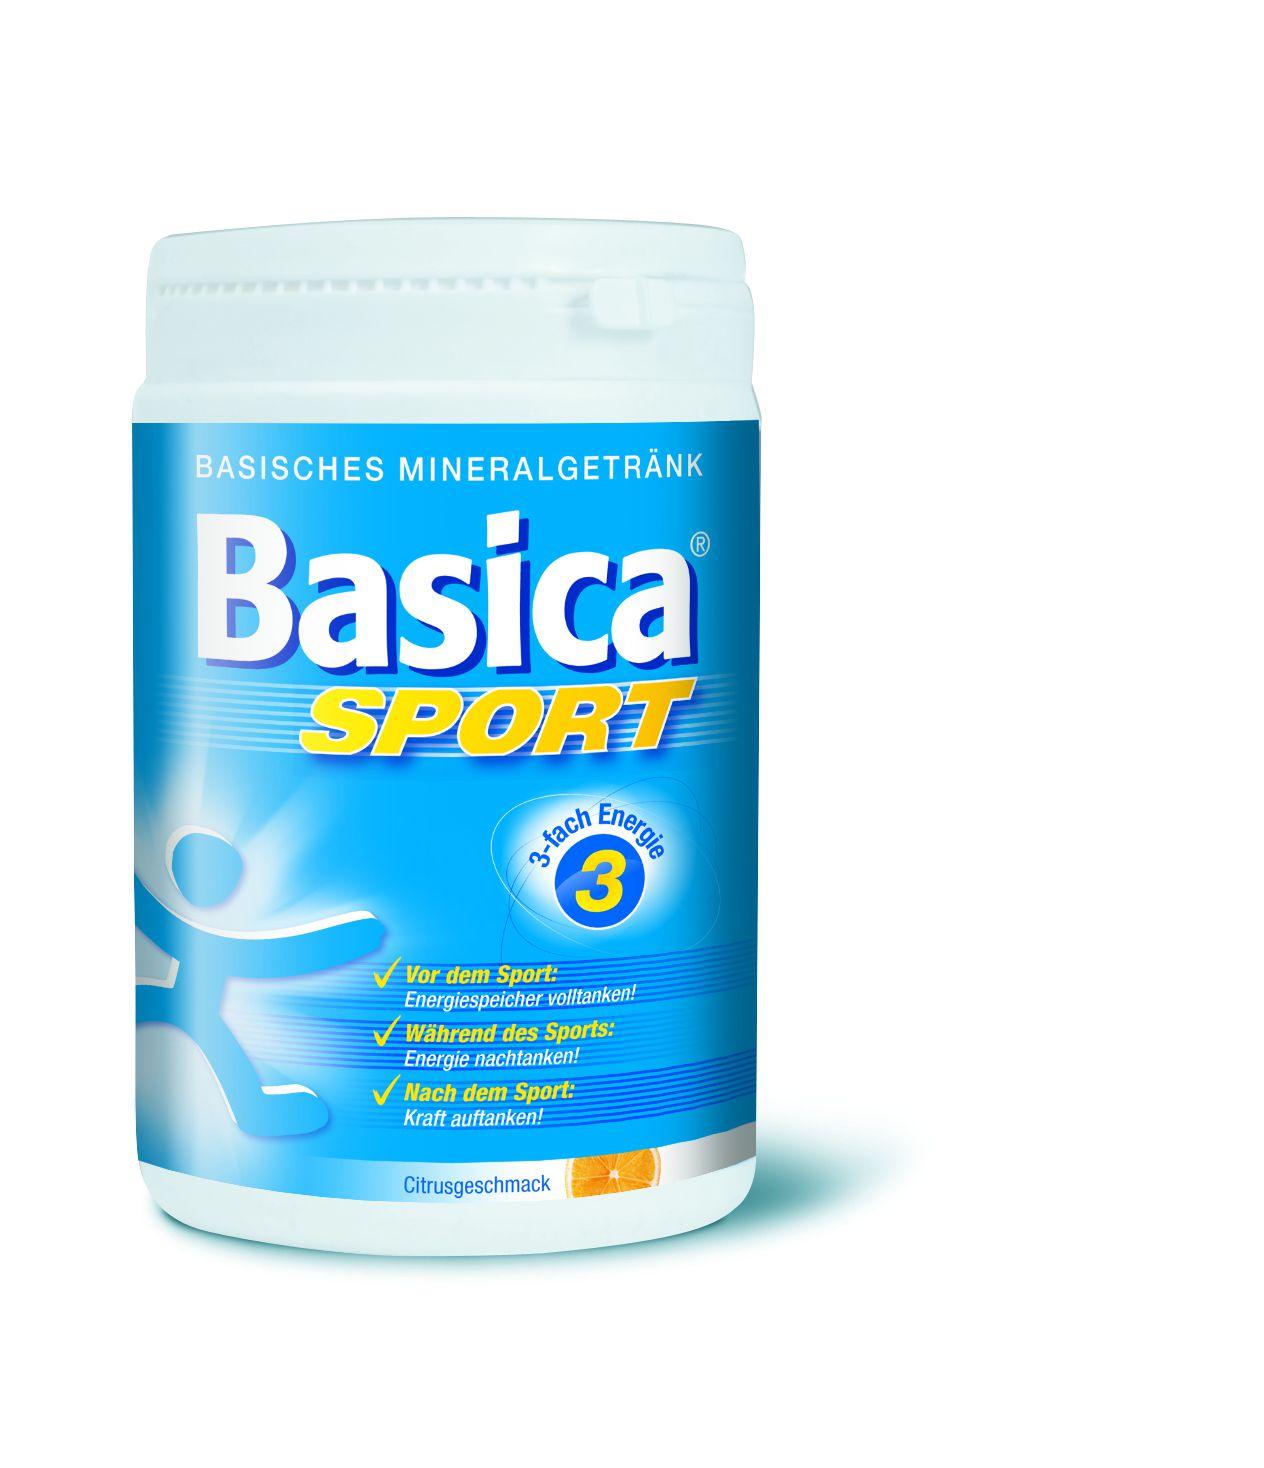 BASICA Sport Mineralgetränk Pulver 660 g - Powerdrinks - Fitness ...